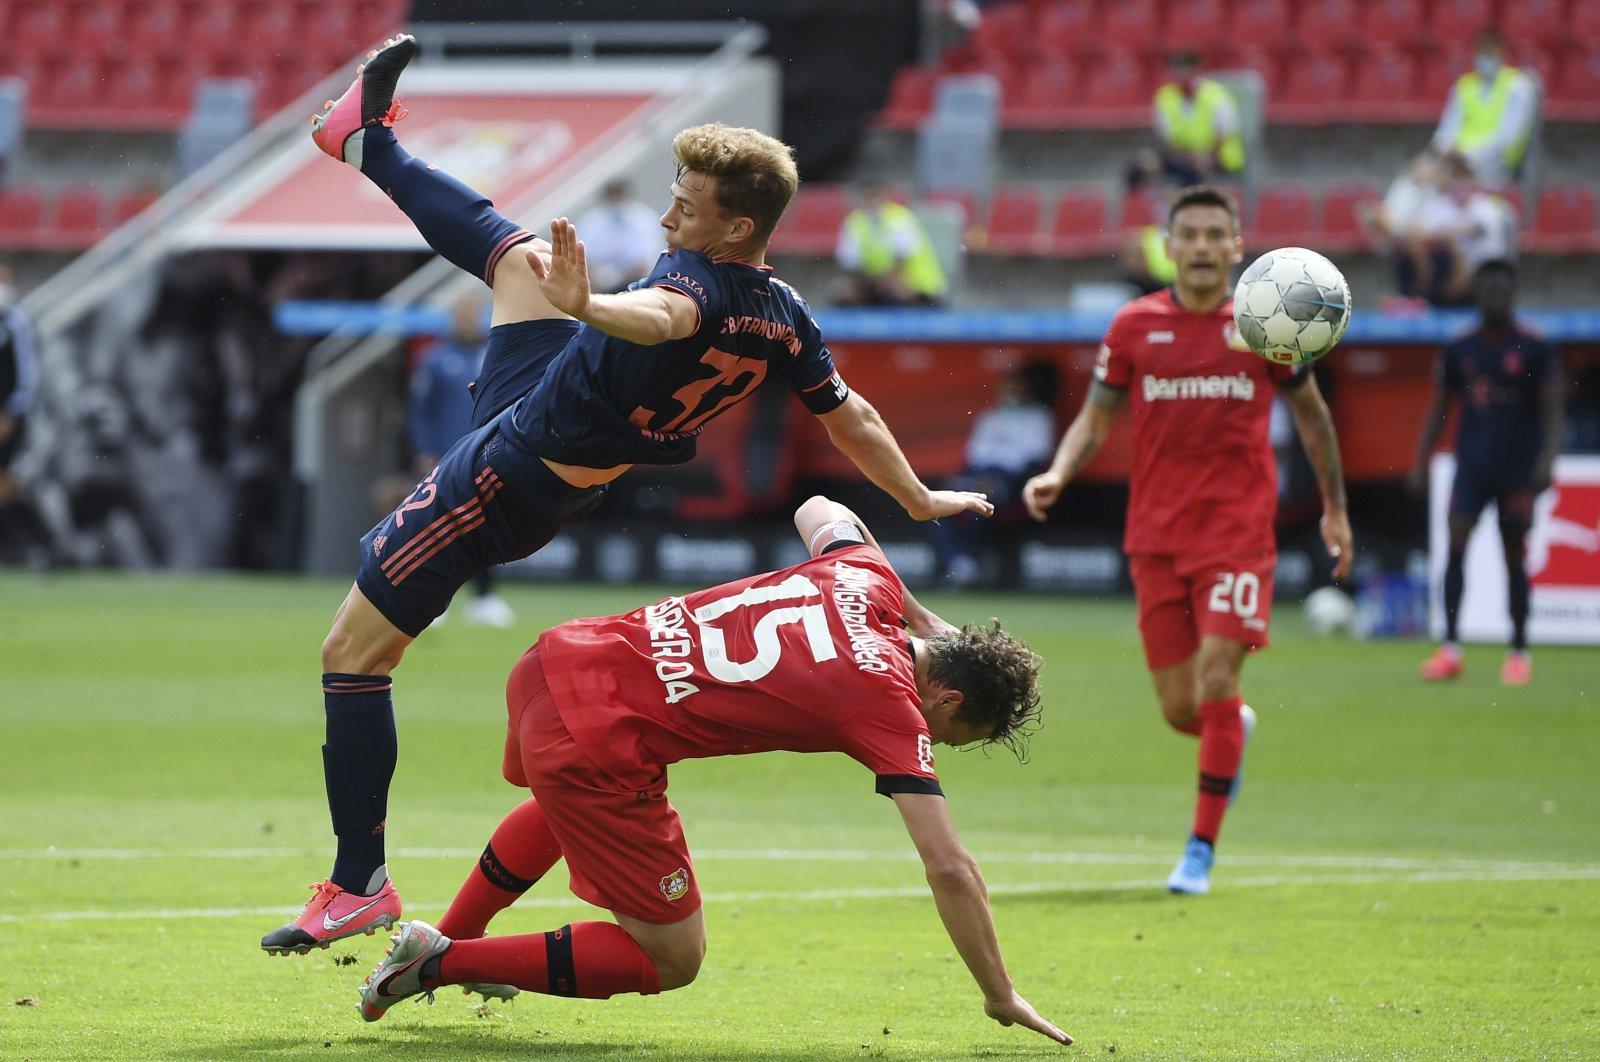 Joshua Kimmich (L) from Munich falls in a duel over Julian Baumgartlinger from Leverkusen during the German Bundesliga football match between Bayer Leverkusen and Bayern Munich in Leverkusen, Germany, June 6, 2020. (Pool via AP)